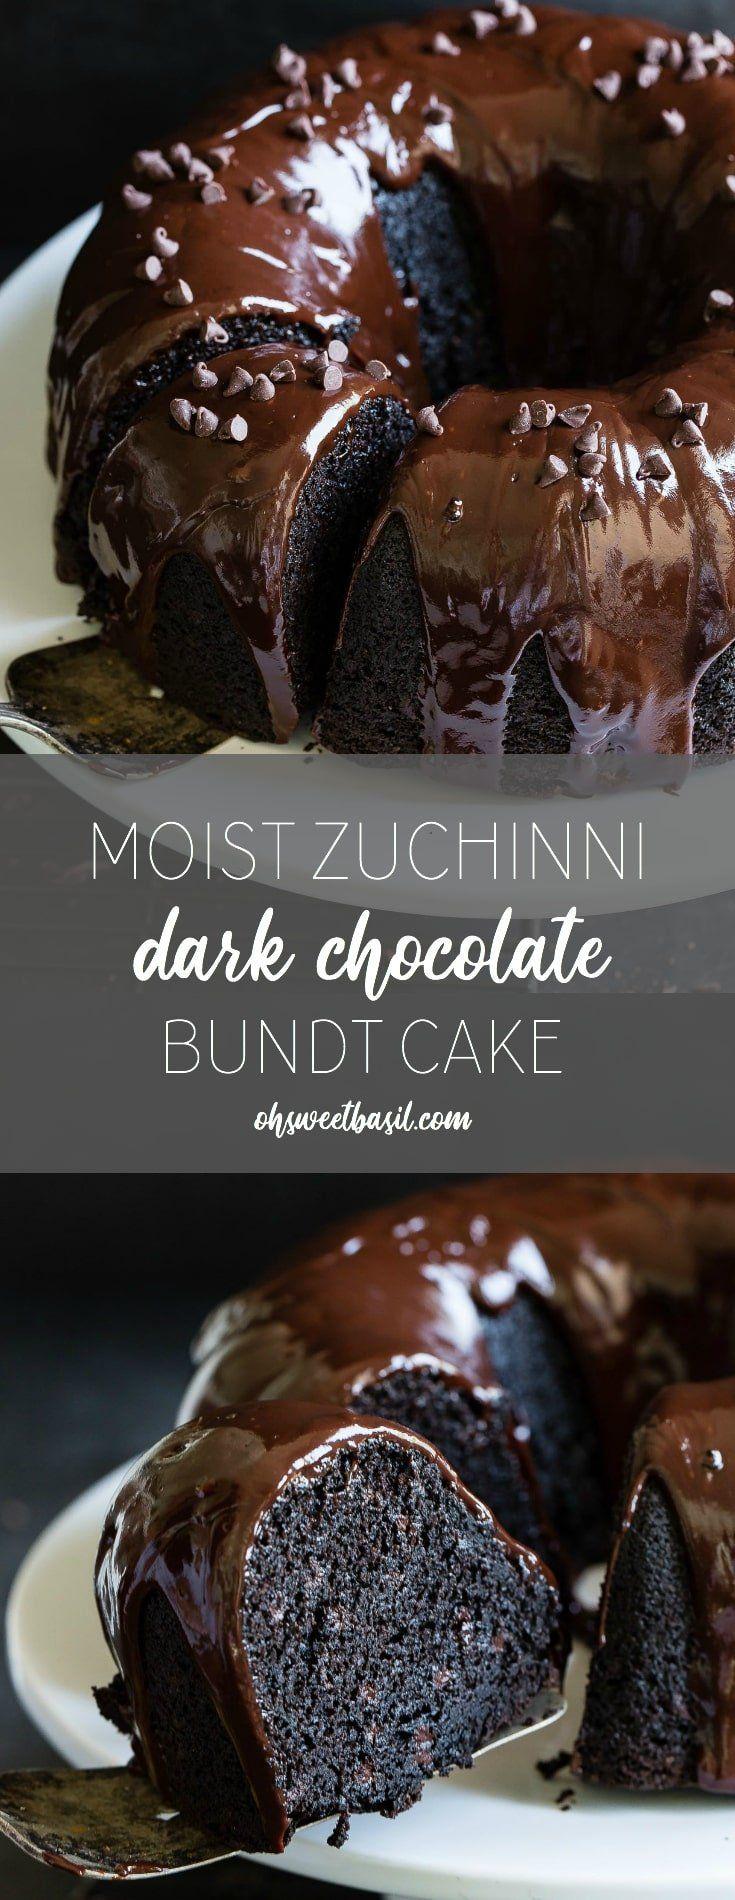 Moist zucchini dark chocolate bundt cake oh sweet basil